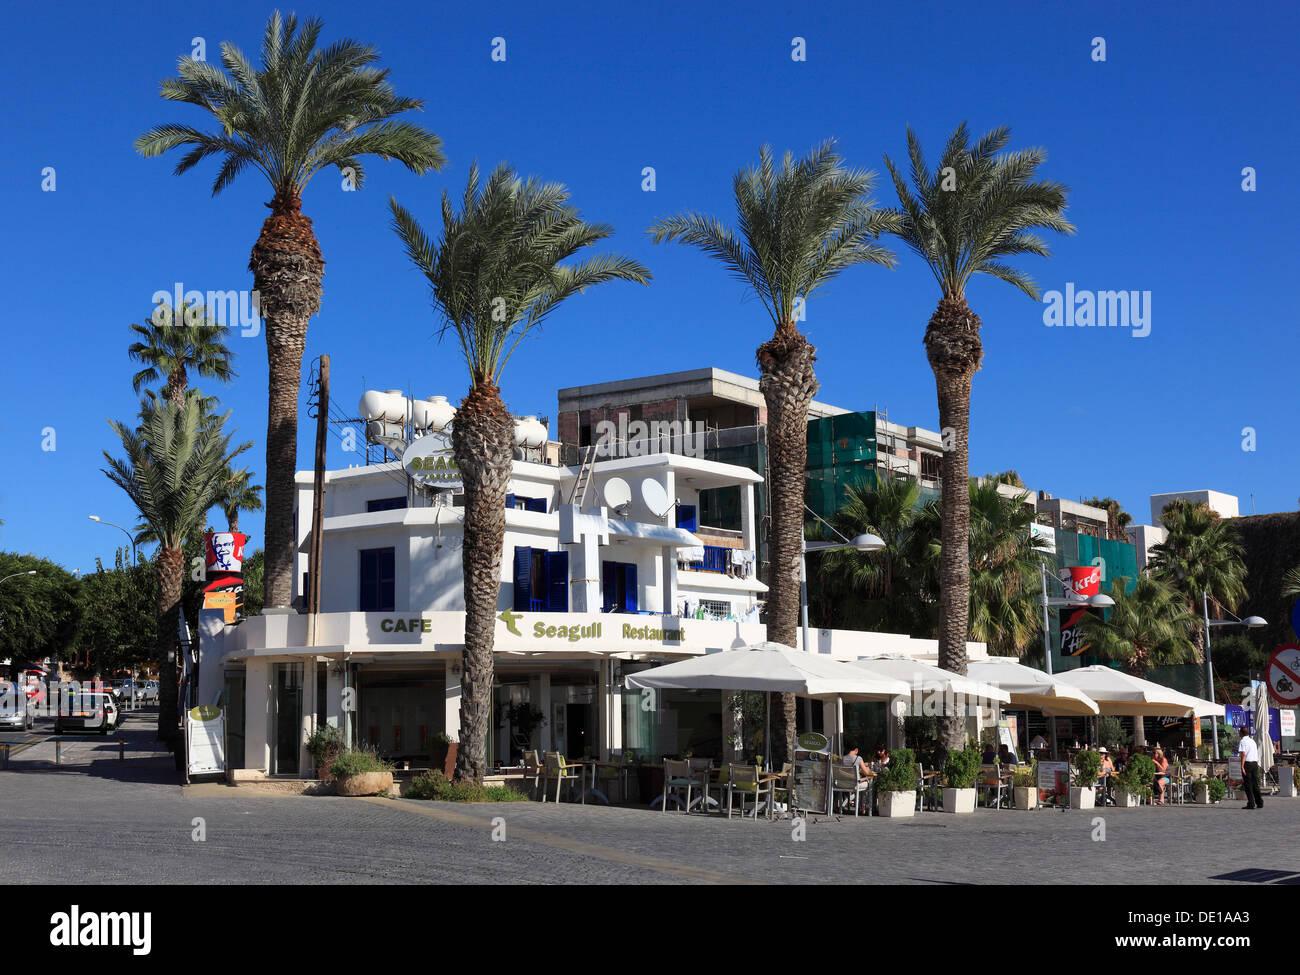 Cyprus, Pafos town, Gazibaf, downtown, pedestrian - Stock Image